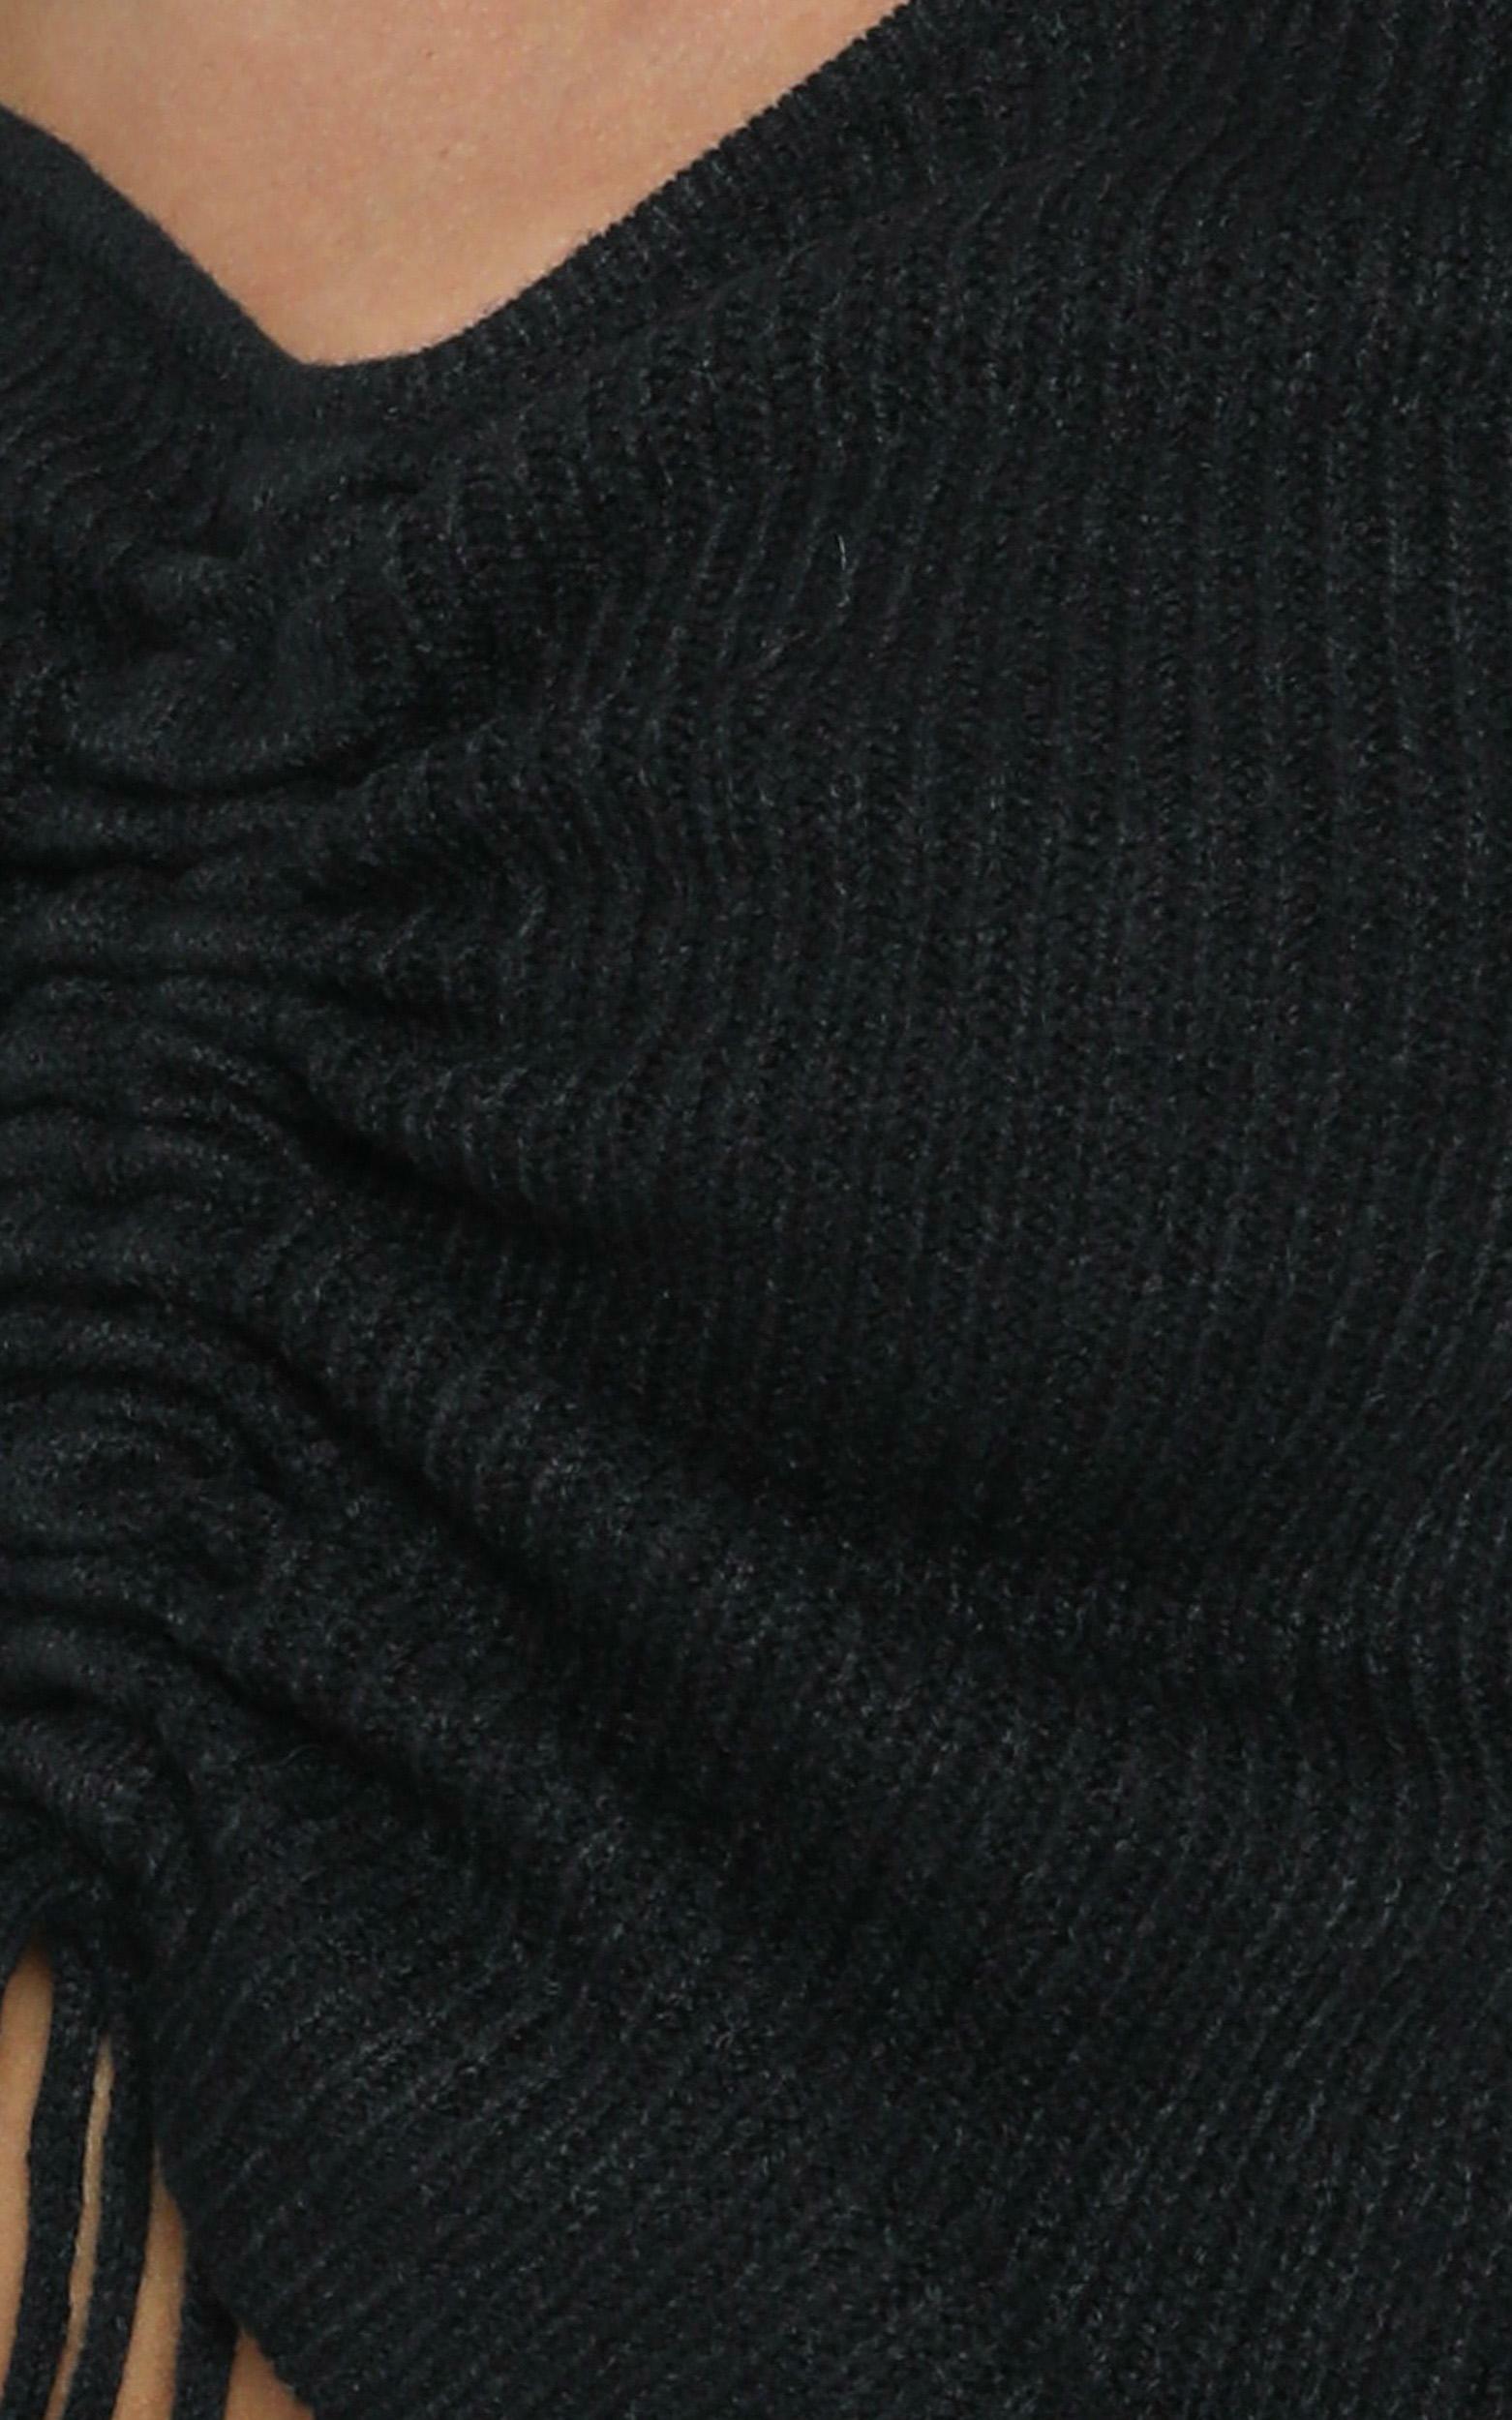 Leia Ruched Detail Knit in black - S/M, Black, hi-res image number null